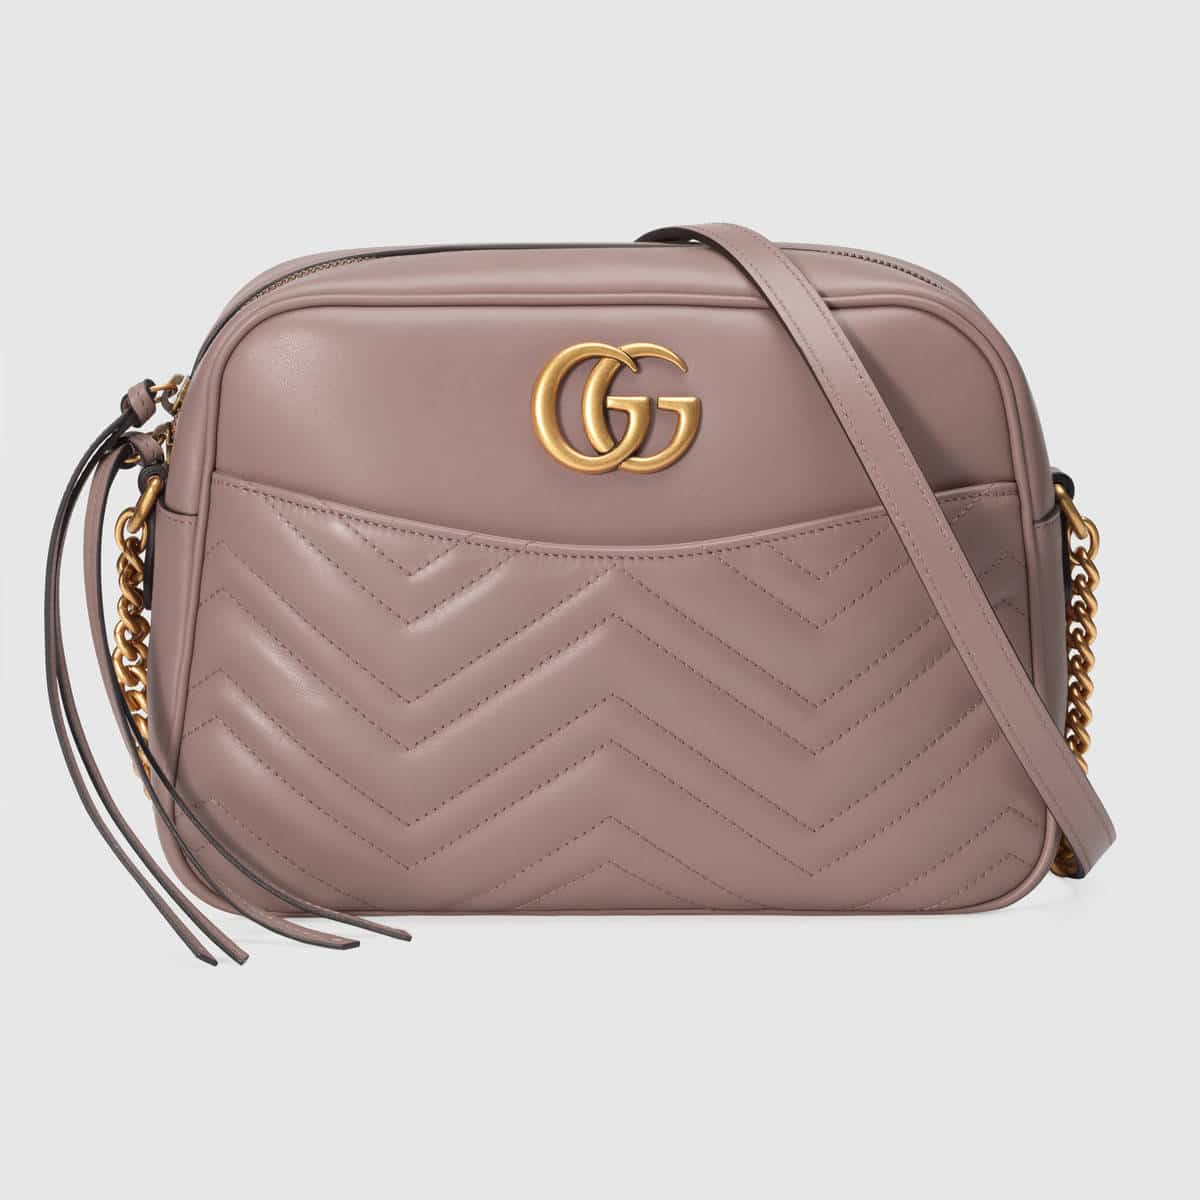 Gucci Gg Marmont Medium Camera Bag